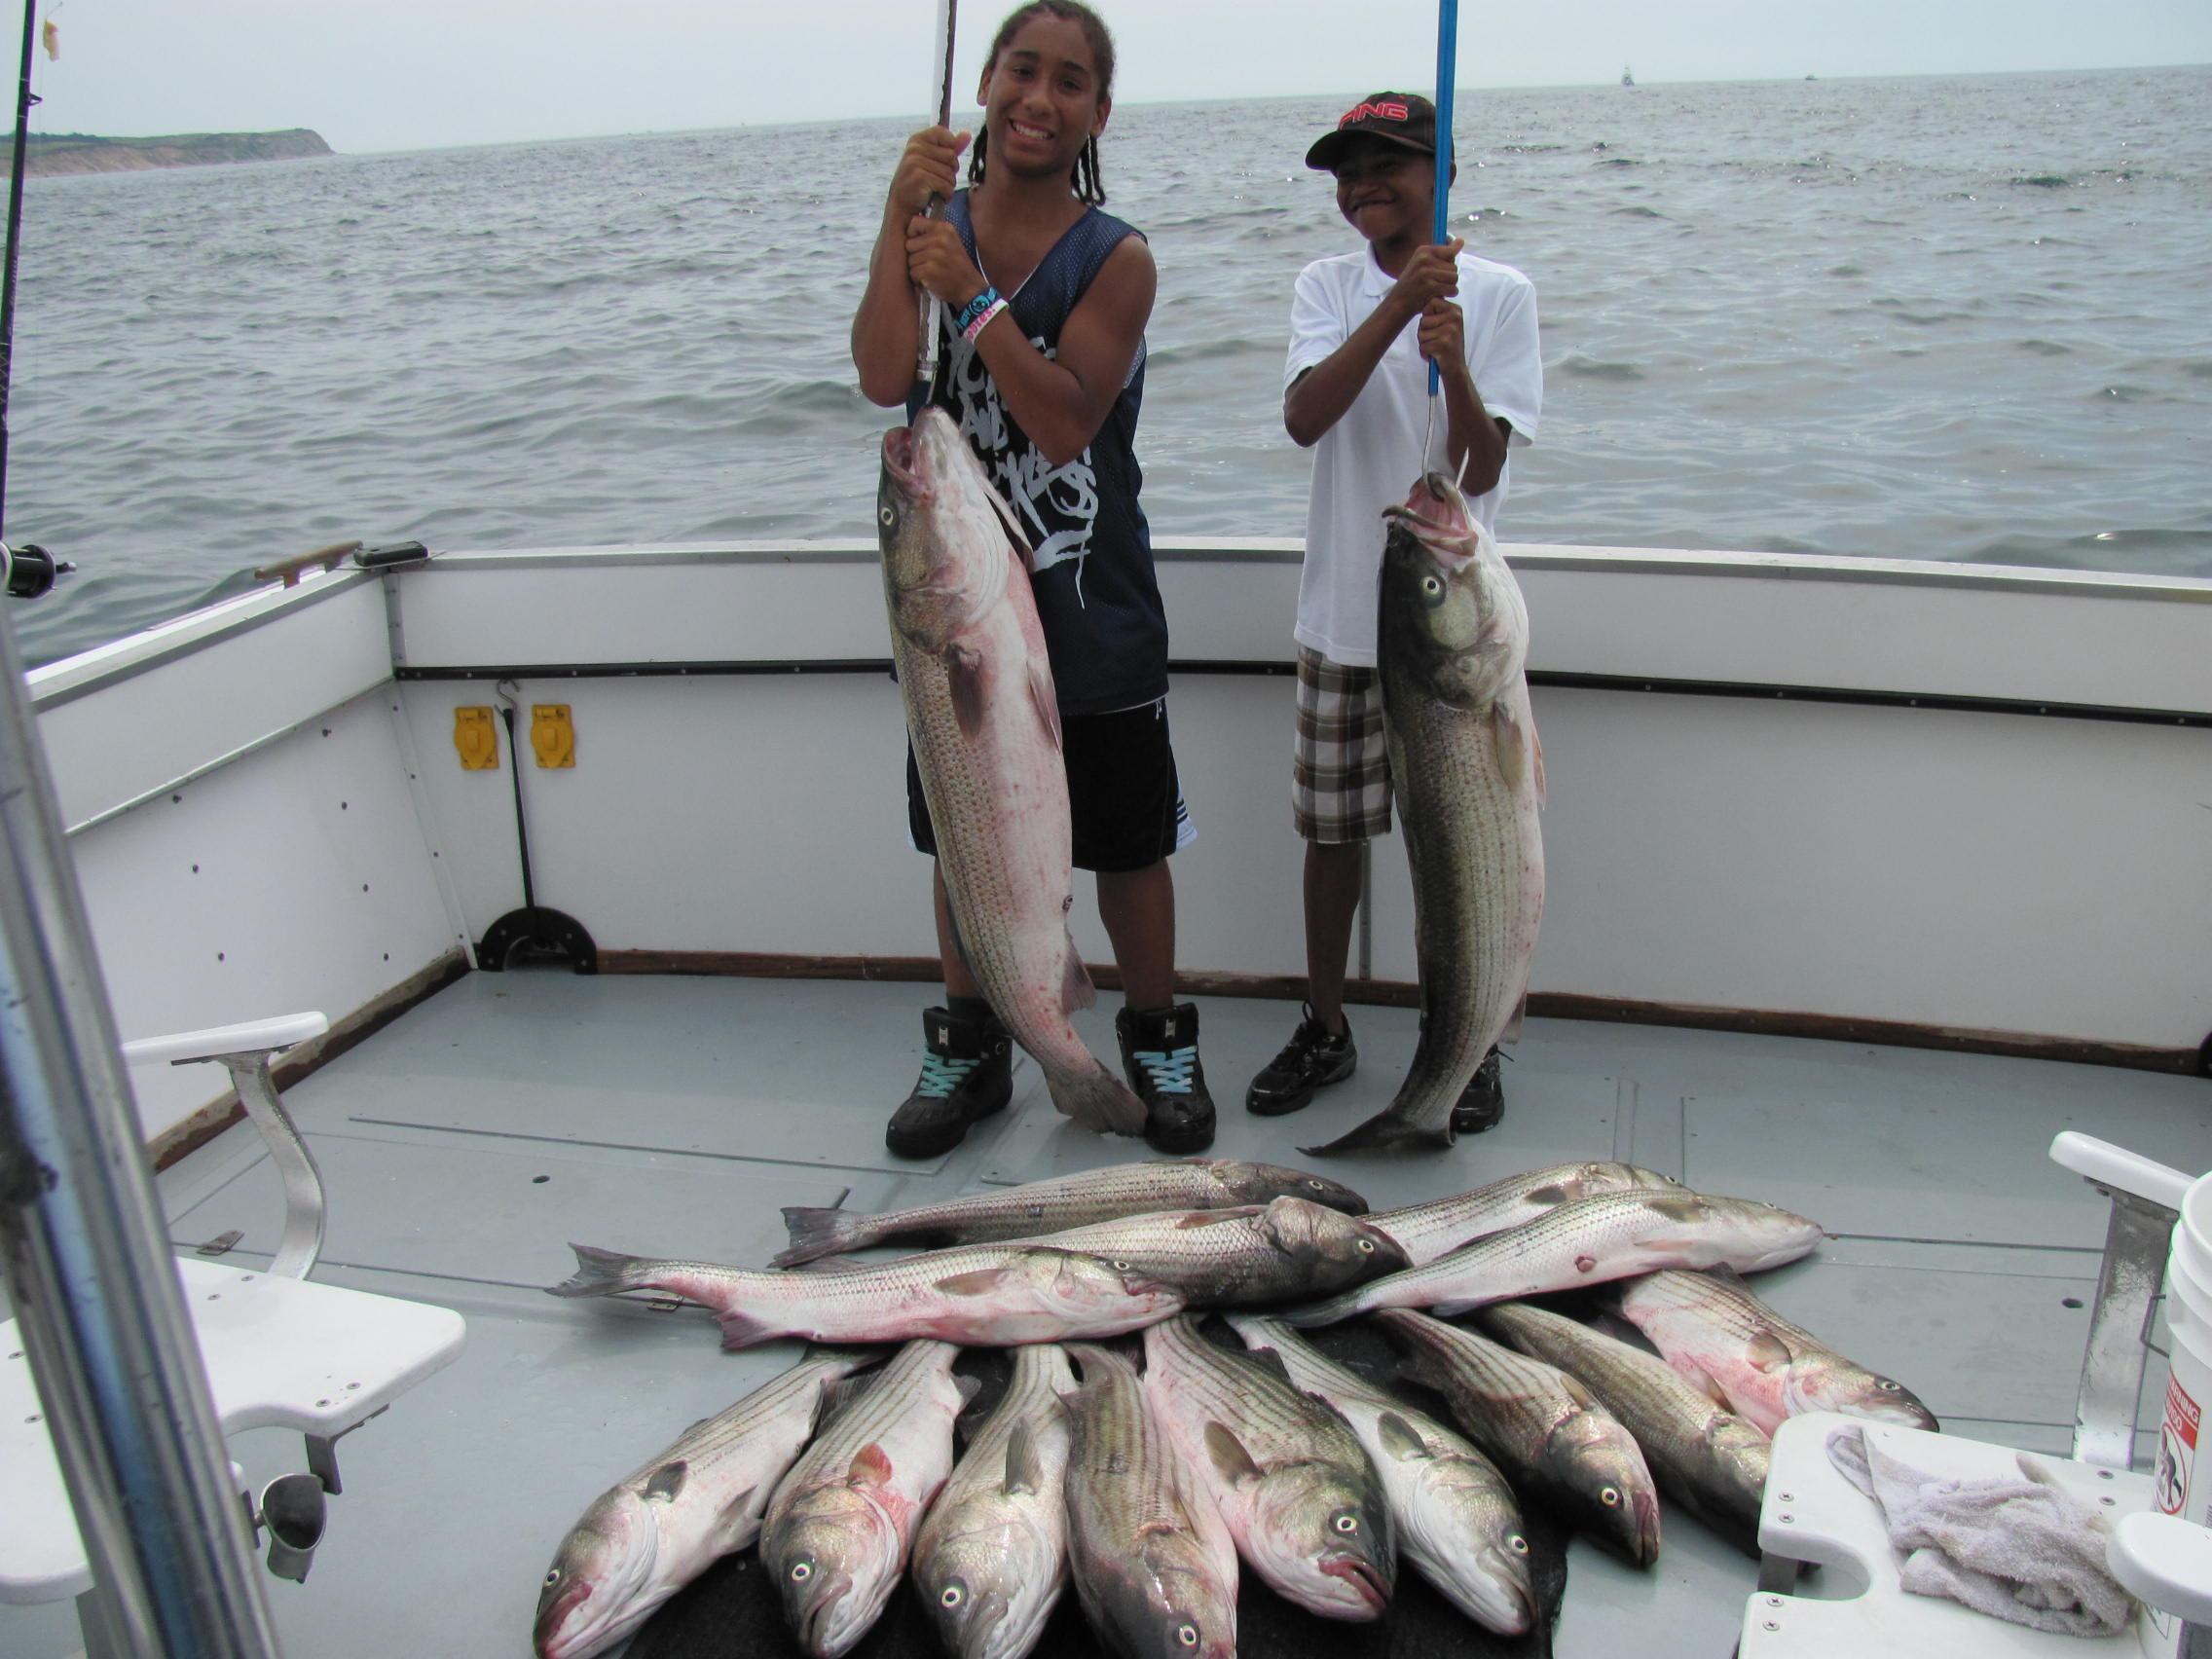 Ri sportfishing charter boat misty photos for Block island fishing charters